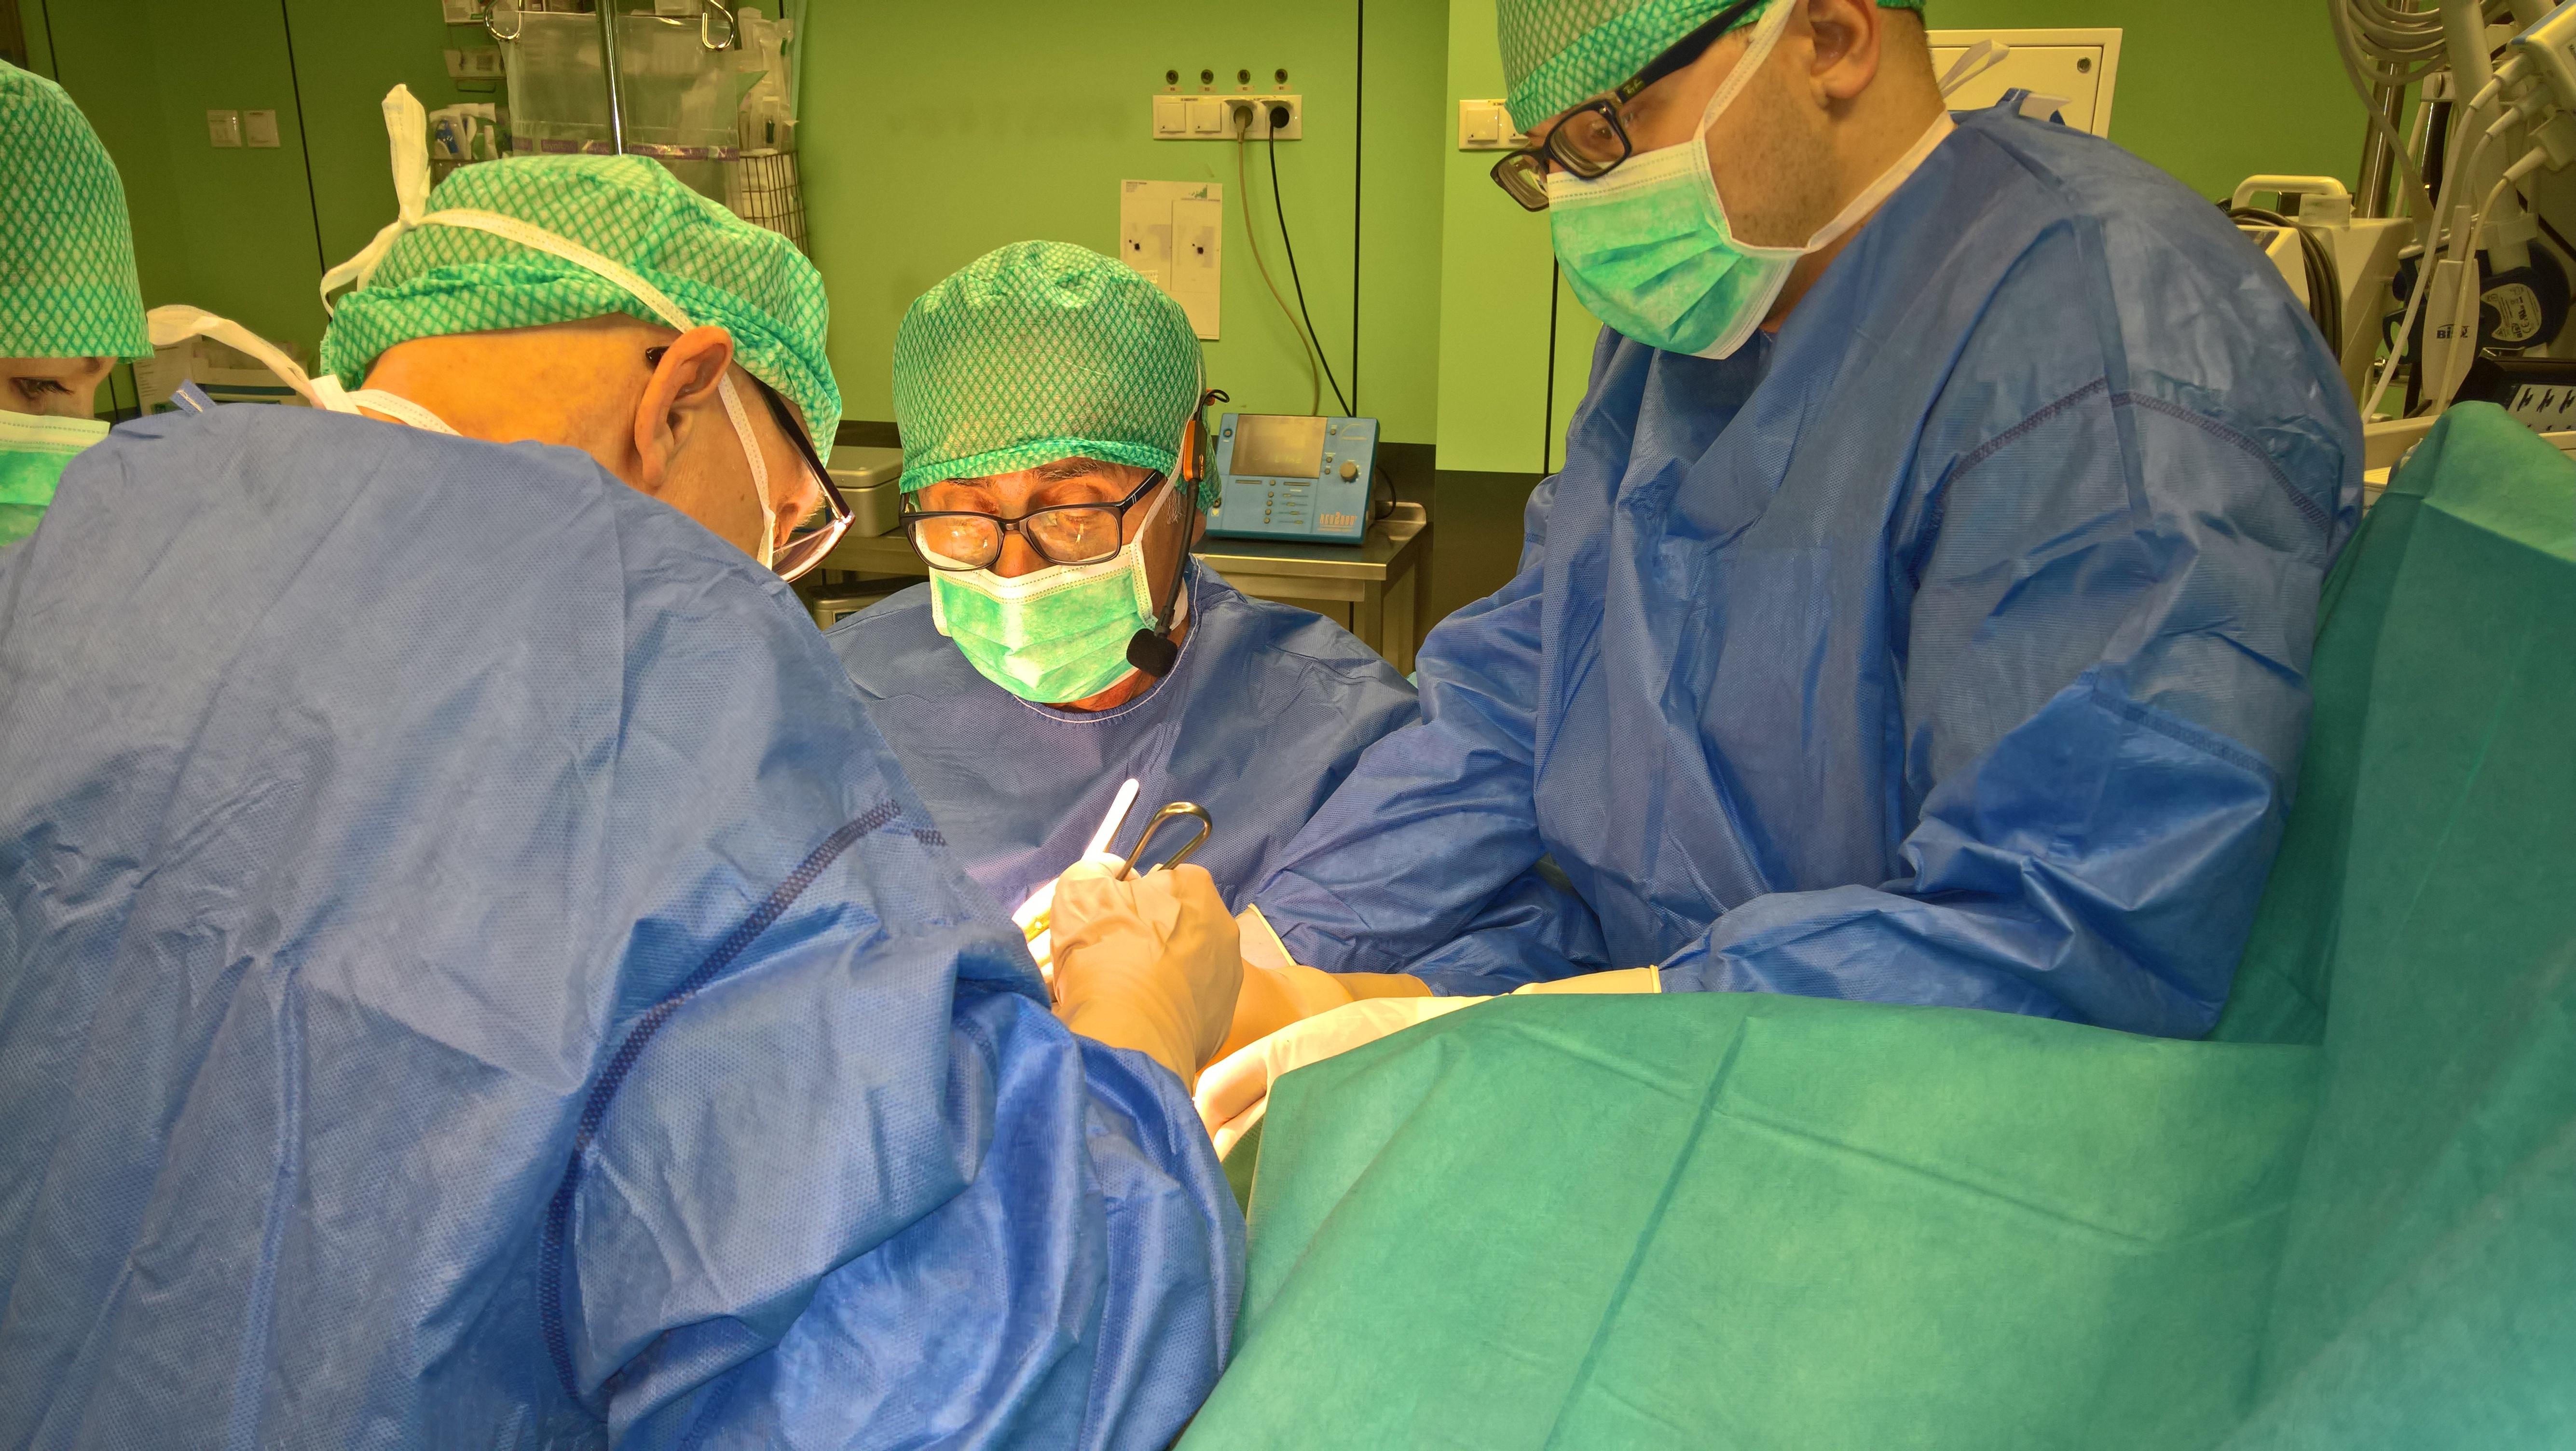 Warsztaty chirurgii...